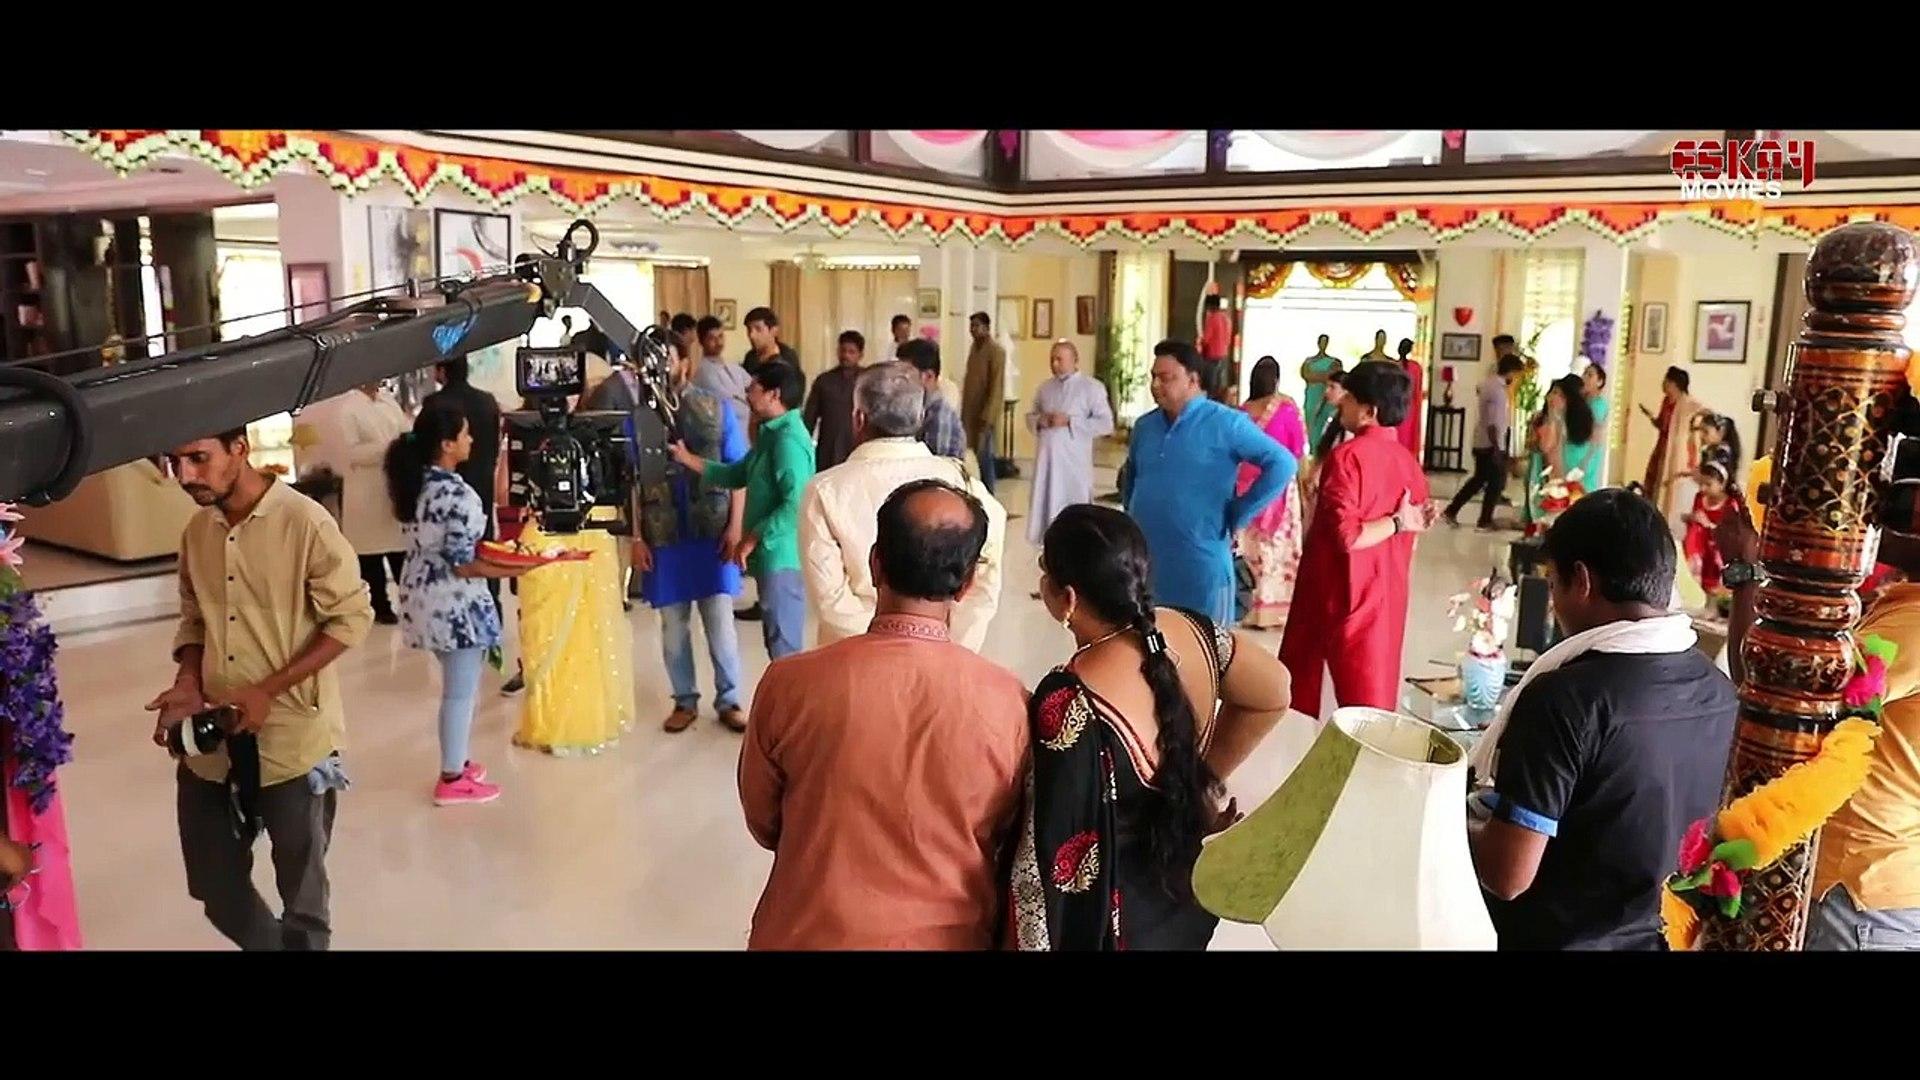 Projapoti Mon | Chaalbaaz | Shakib Khan | Subhashree Ganguly | Latest  Bengali Movie|Vevo Official channel|Top 10 Bangla Song This Week| New  Bangla Song 2018| New Upcoming Bangla Movie Song 2018|New